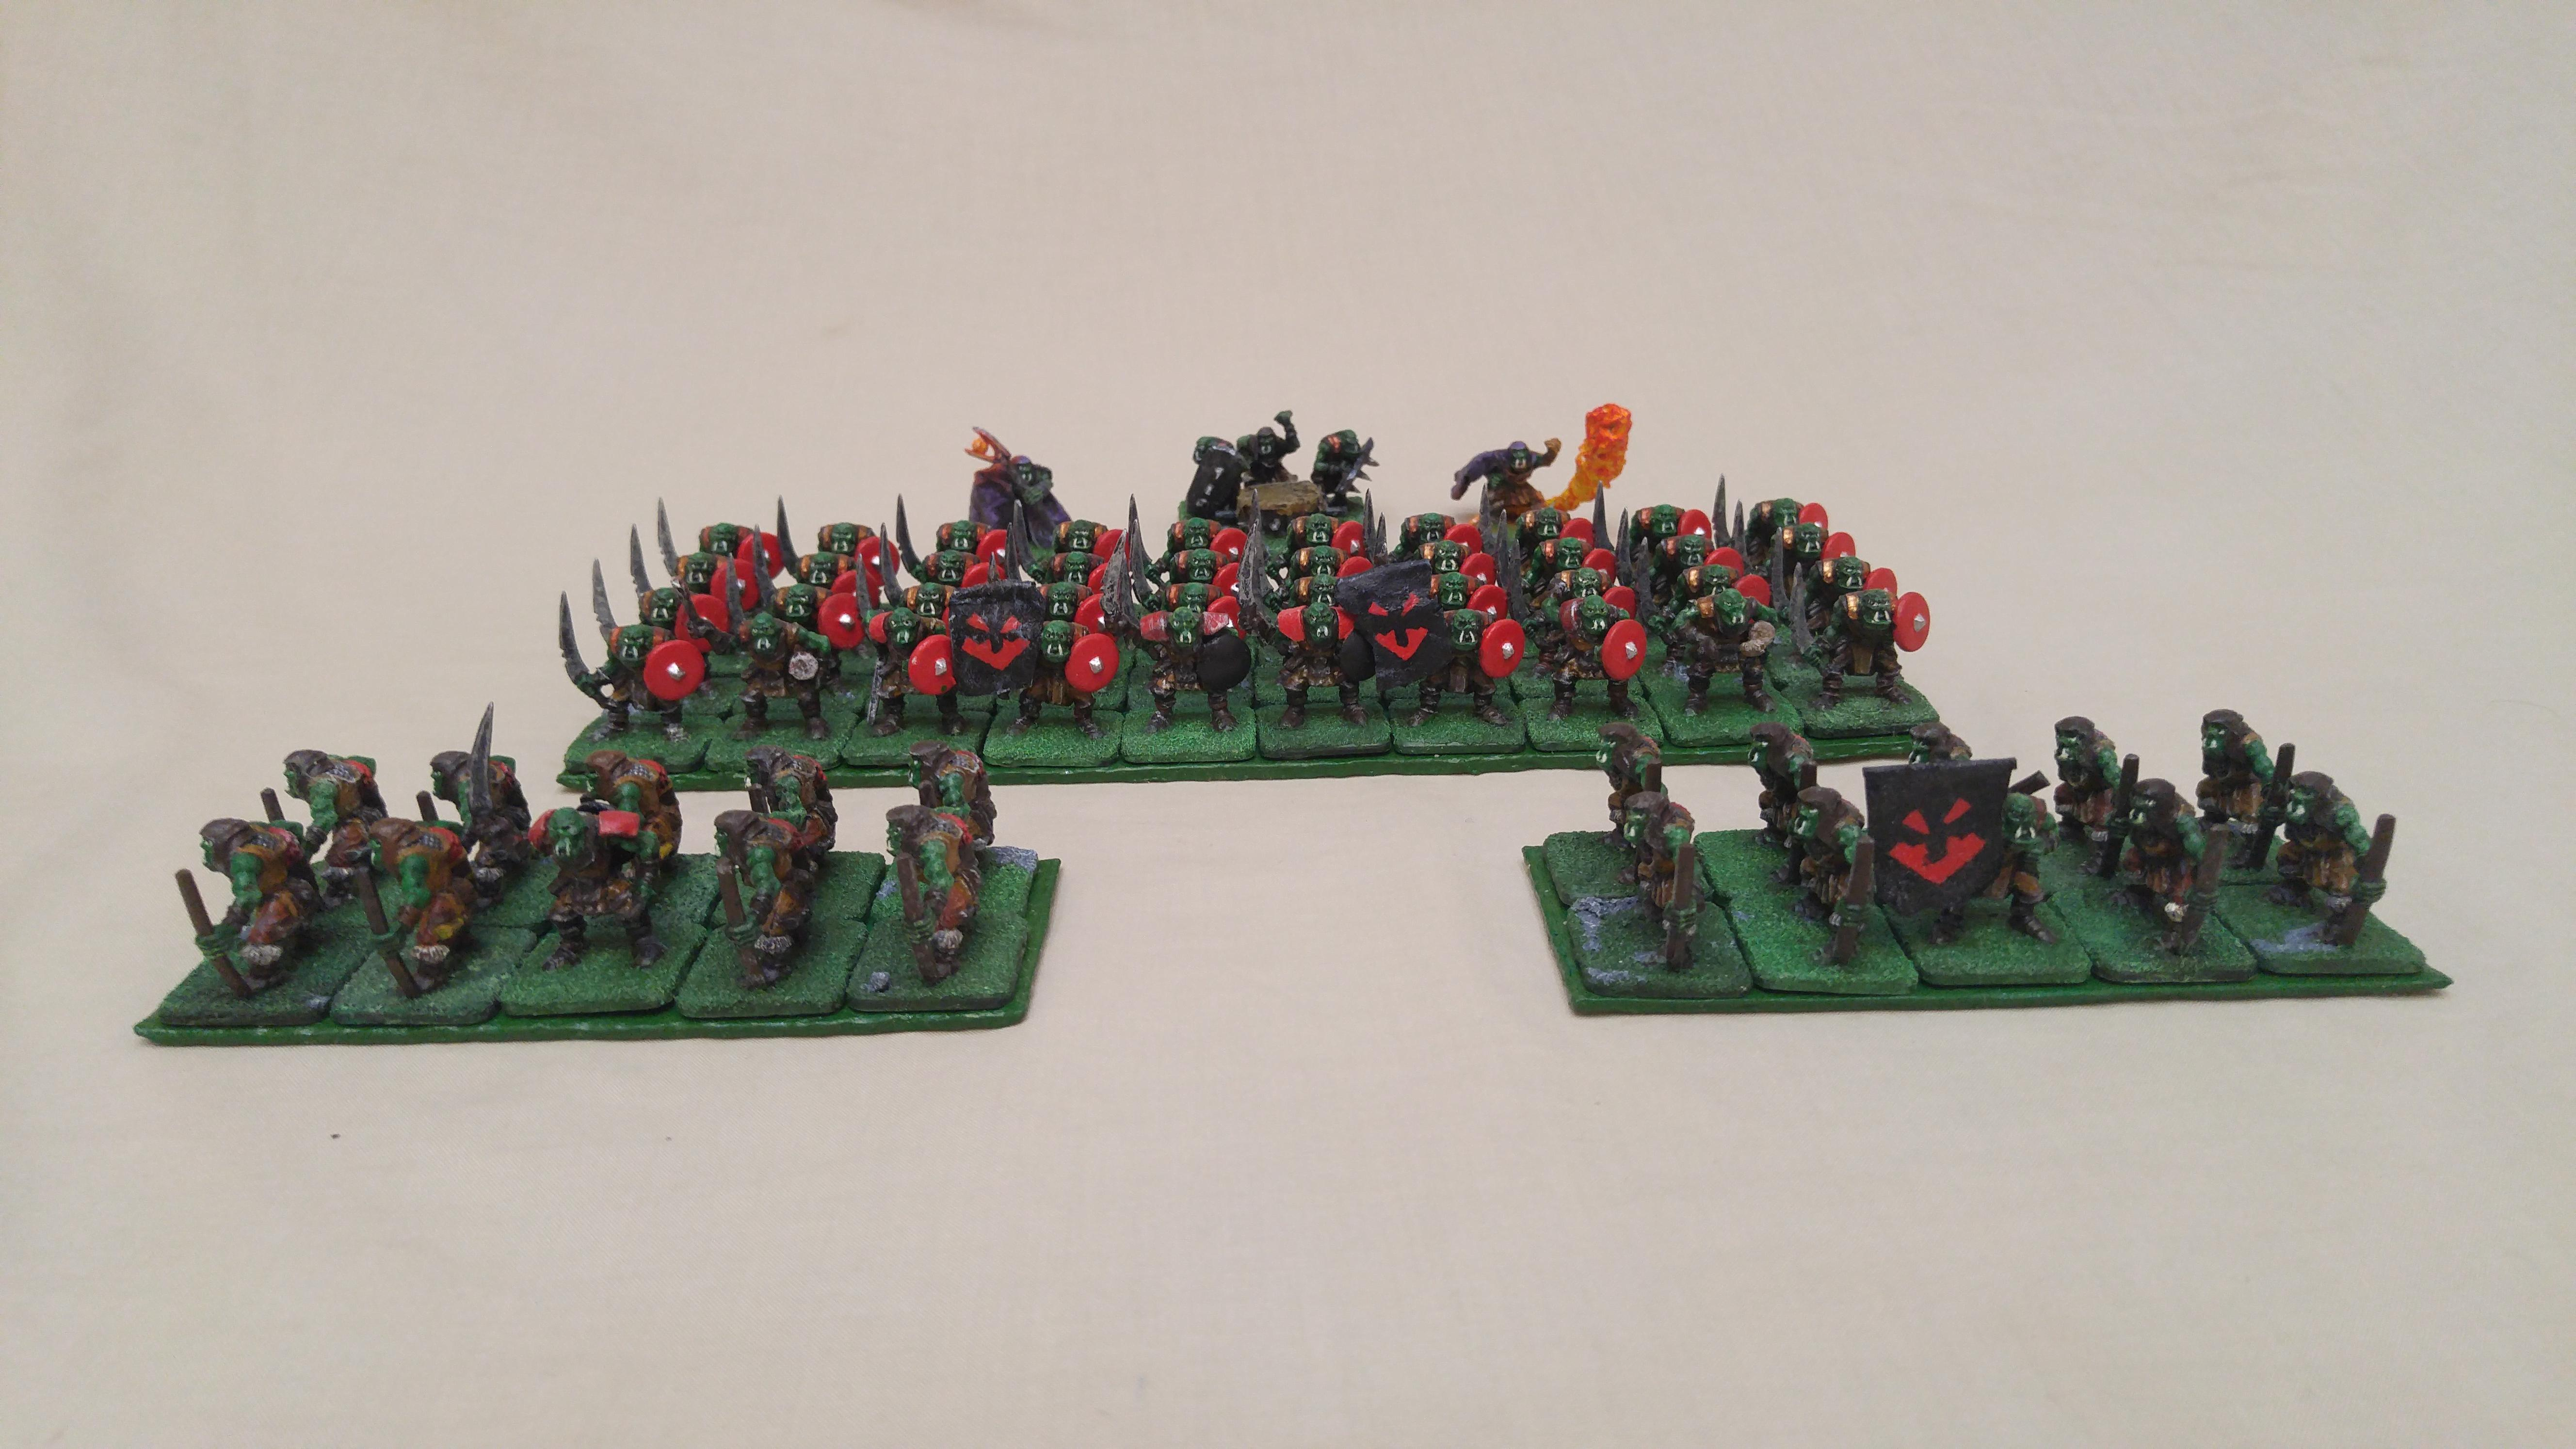 Ax Horde, Cheap, Em4, Fire, Godspeaker, Kings Of War, Kow, Object Source Lighting, Orcs, Orks, Skulk, War Drum